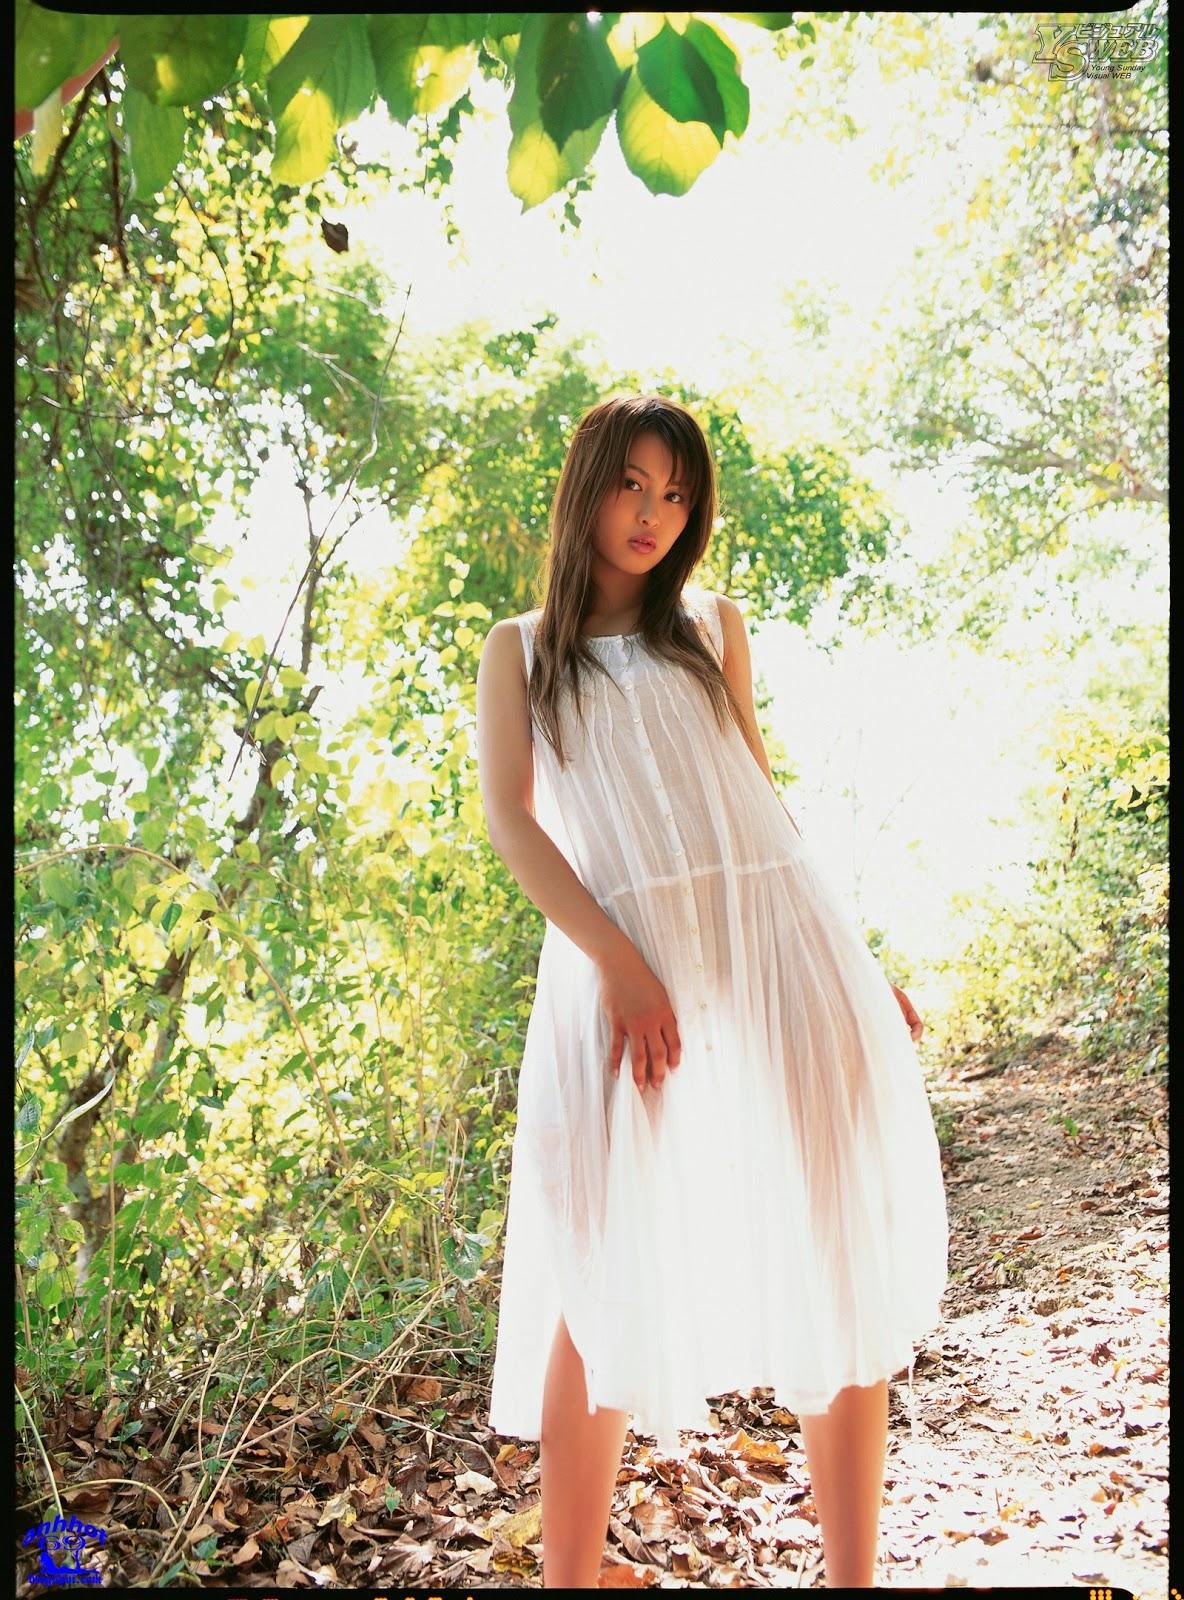 yuuki-mihara-02774887